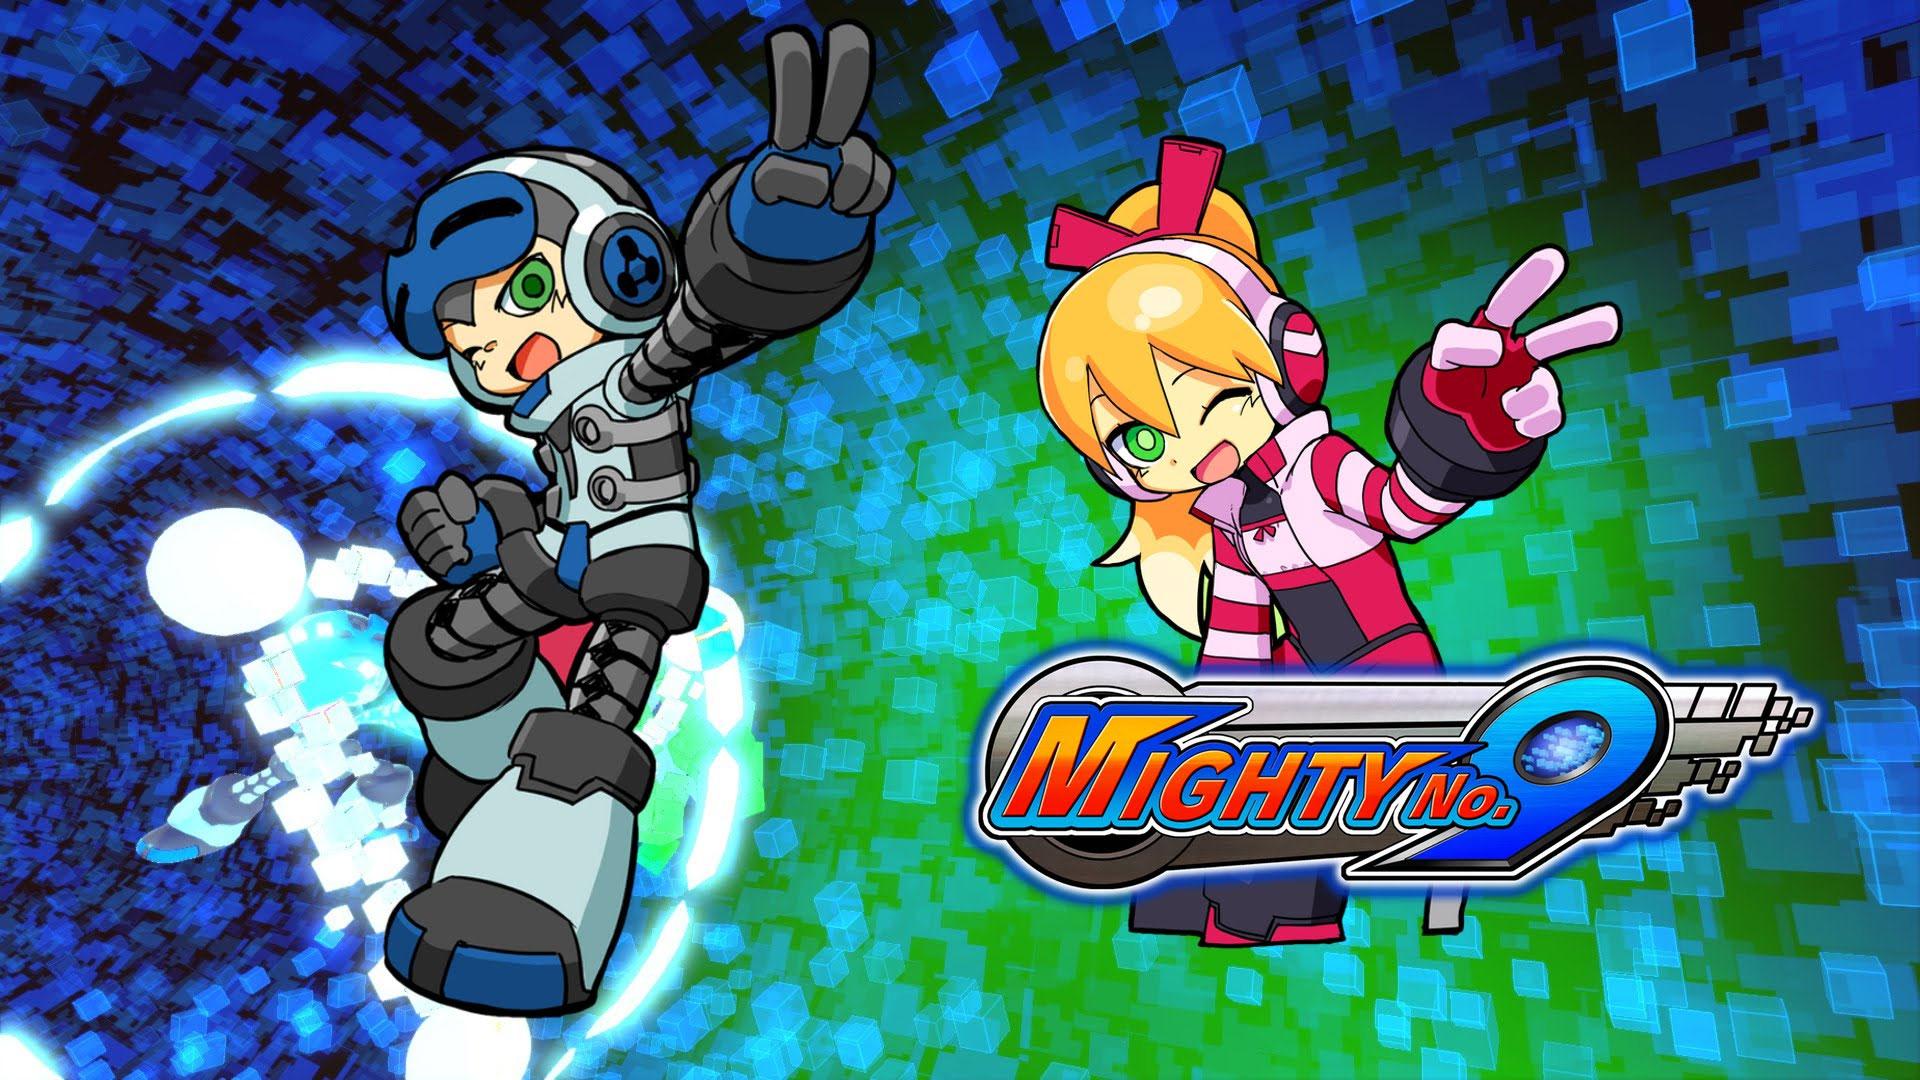 Mighty No 9 Wallpapers In Ultra HD 4K Gameranx